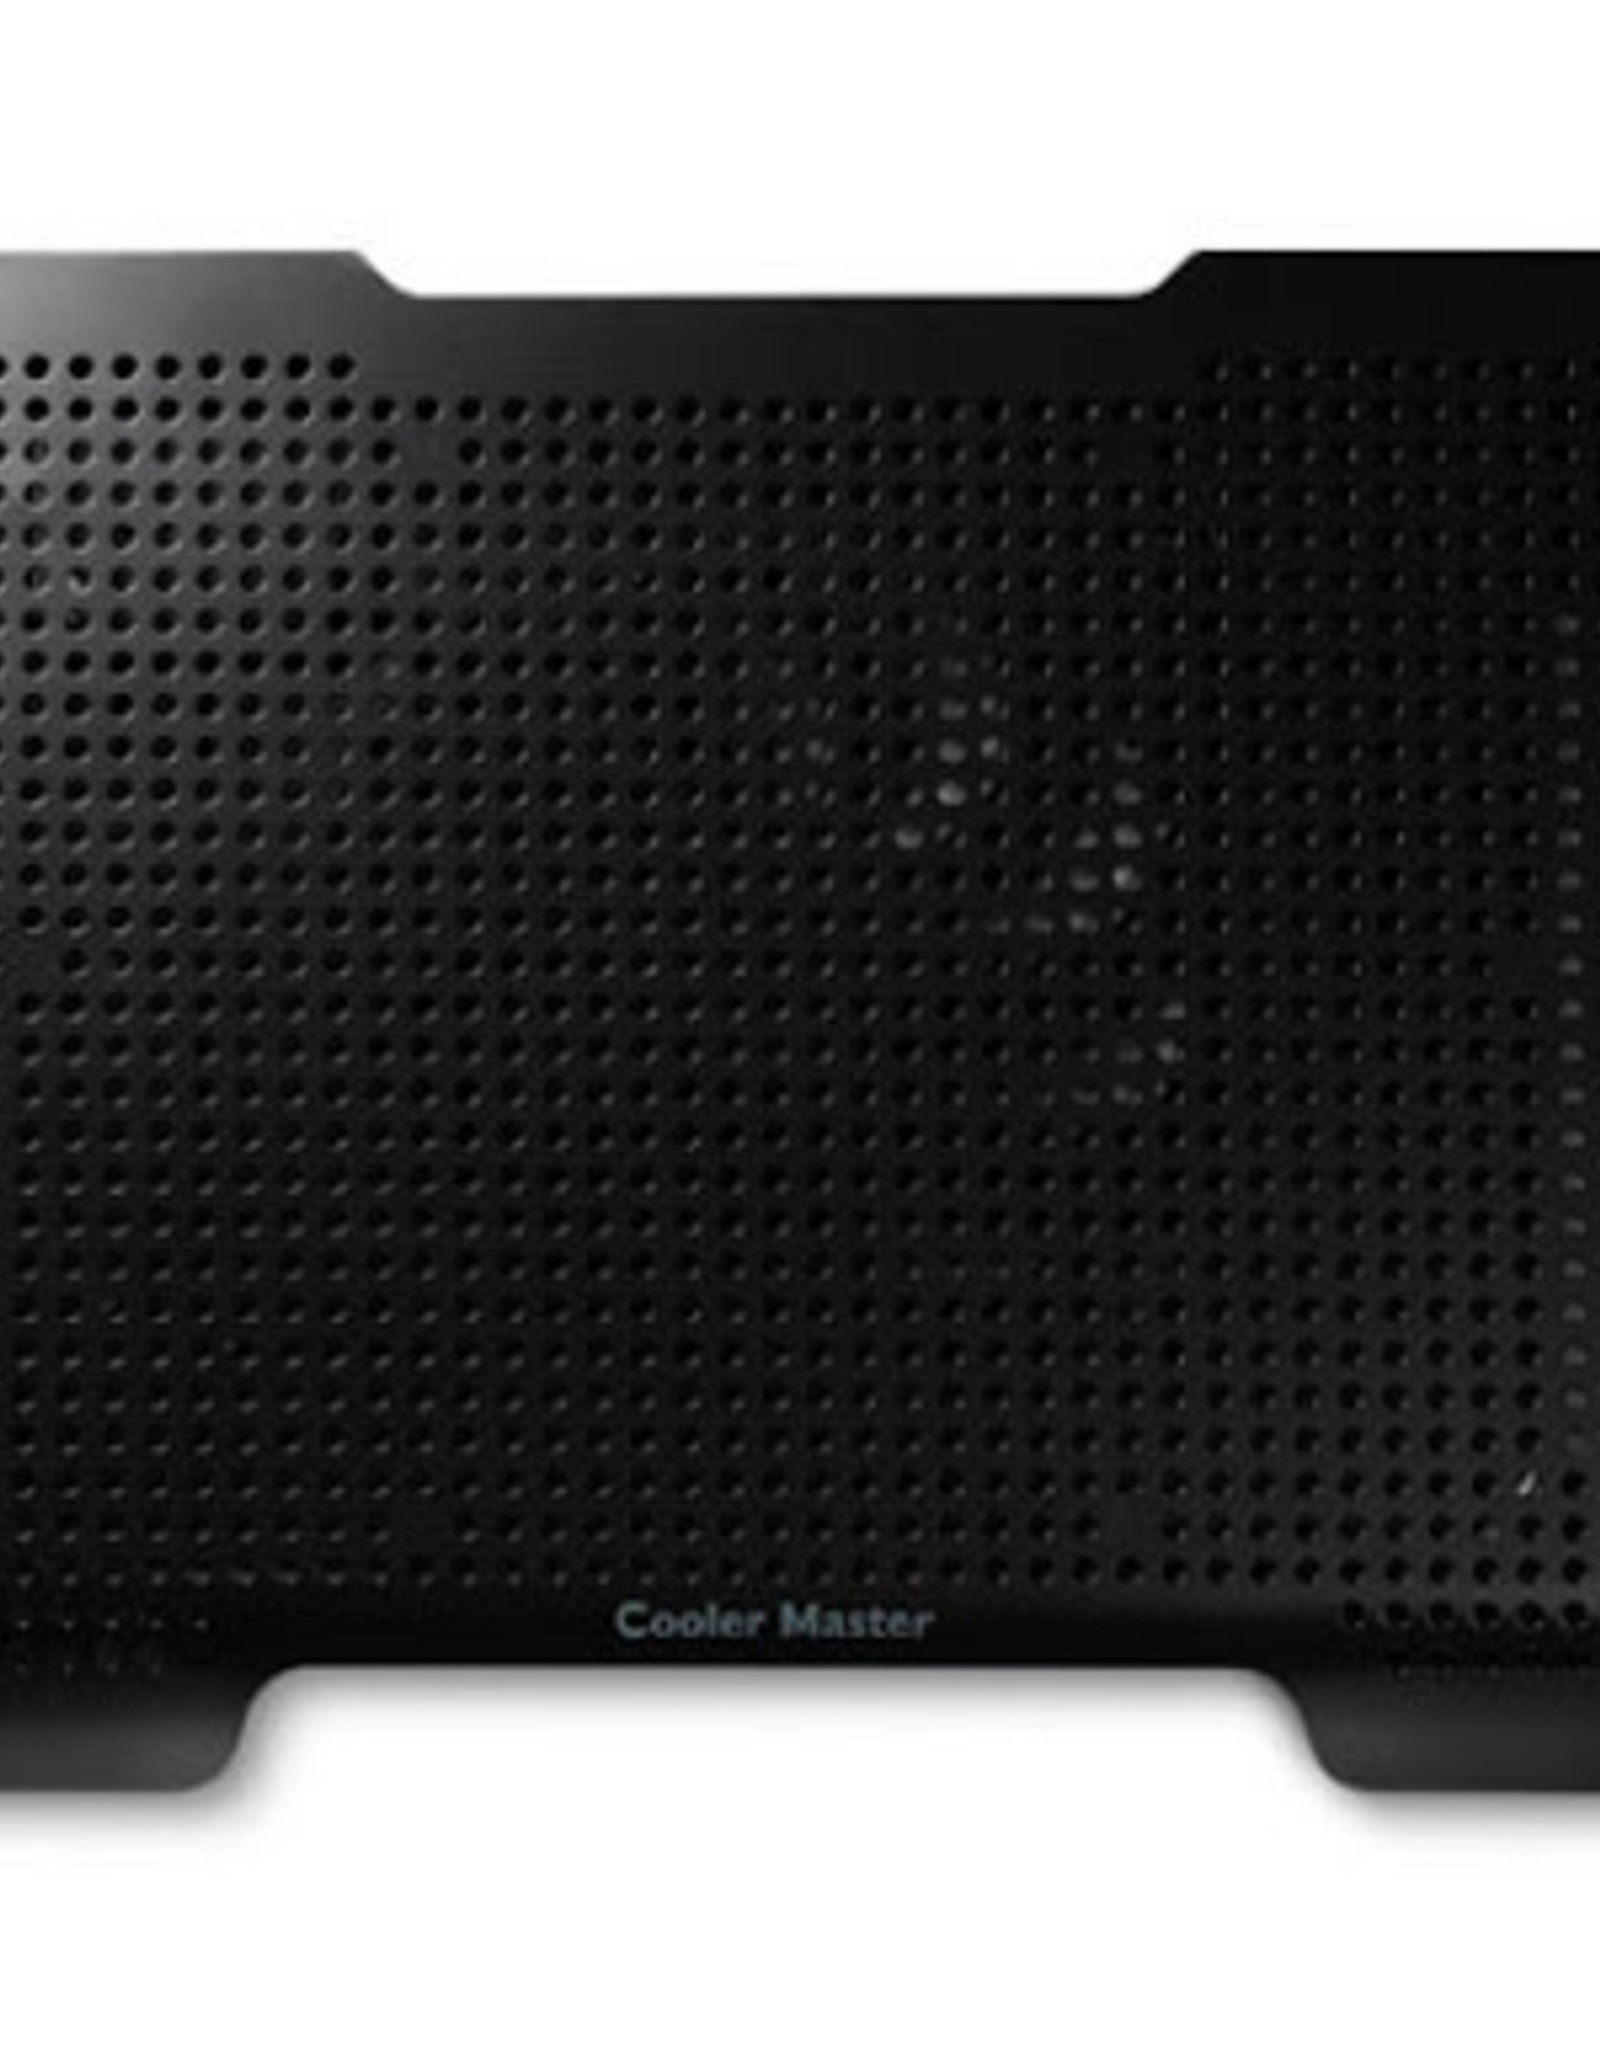 CoolerMaster CoolerMaster | AC Notepal X-LITE II USB up to 15.6 laptops Black | R9-NBC-XL2K-GP